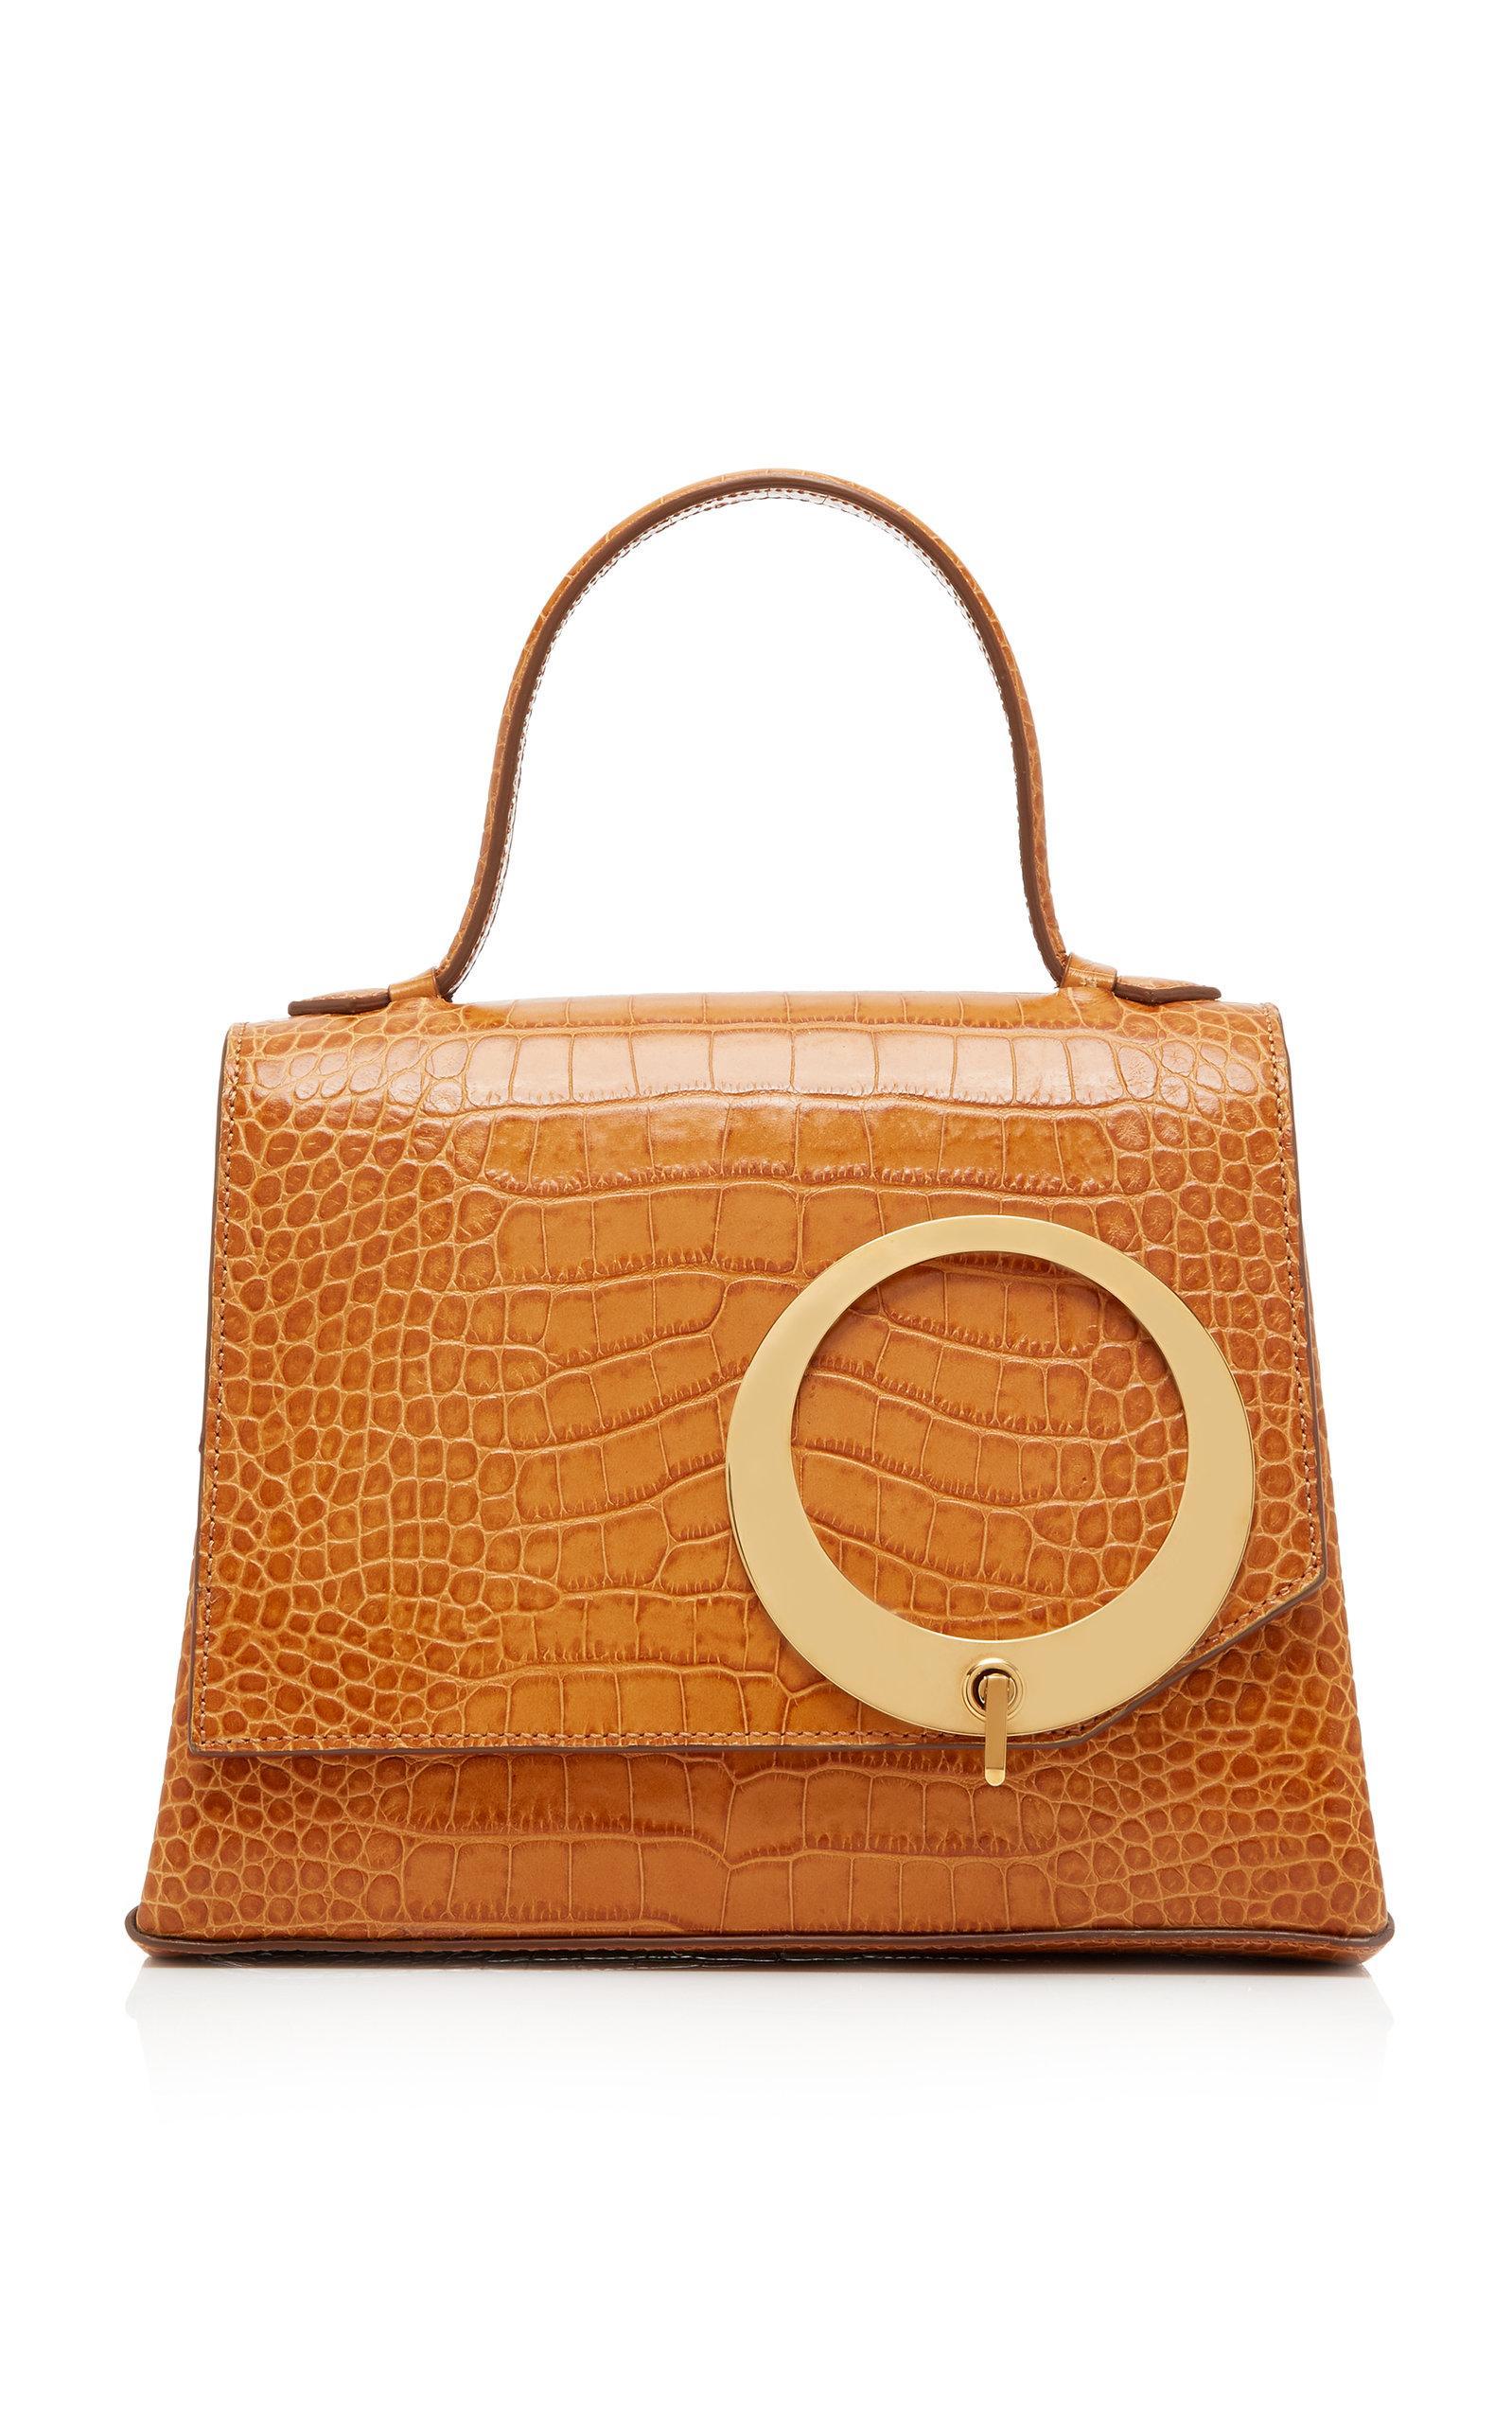 Trademark Harriet Croc-embossed Leather Bag In Neutral